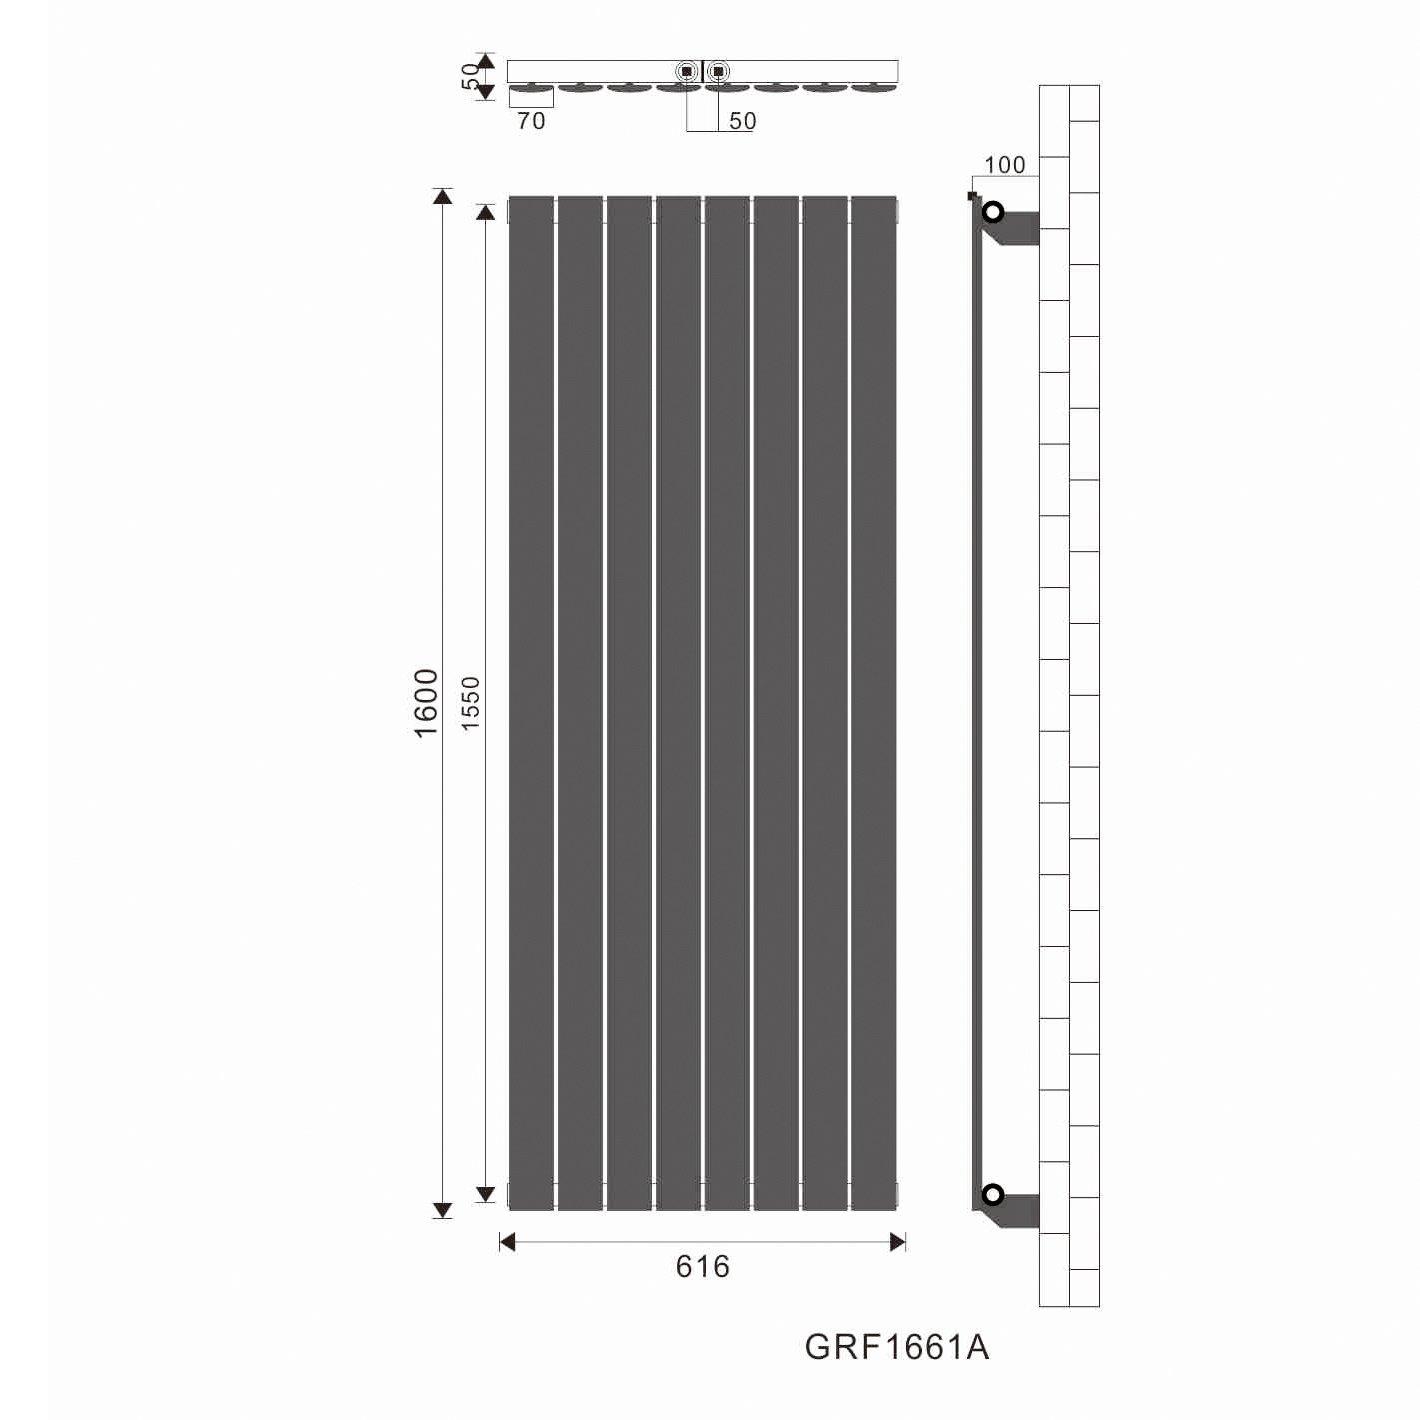 Design Flach Heizk/örper 1800x616mm Wei/ß Paneelheizk/örper Vertikal Mittelanschluss Doppellagig